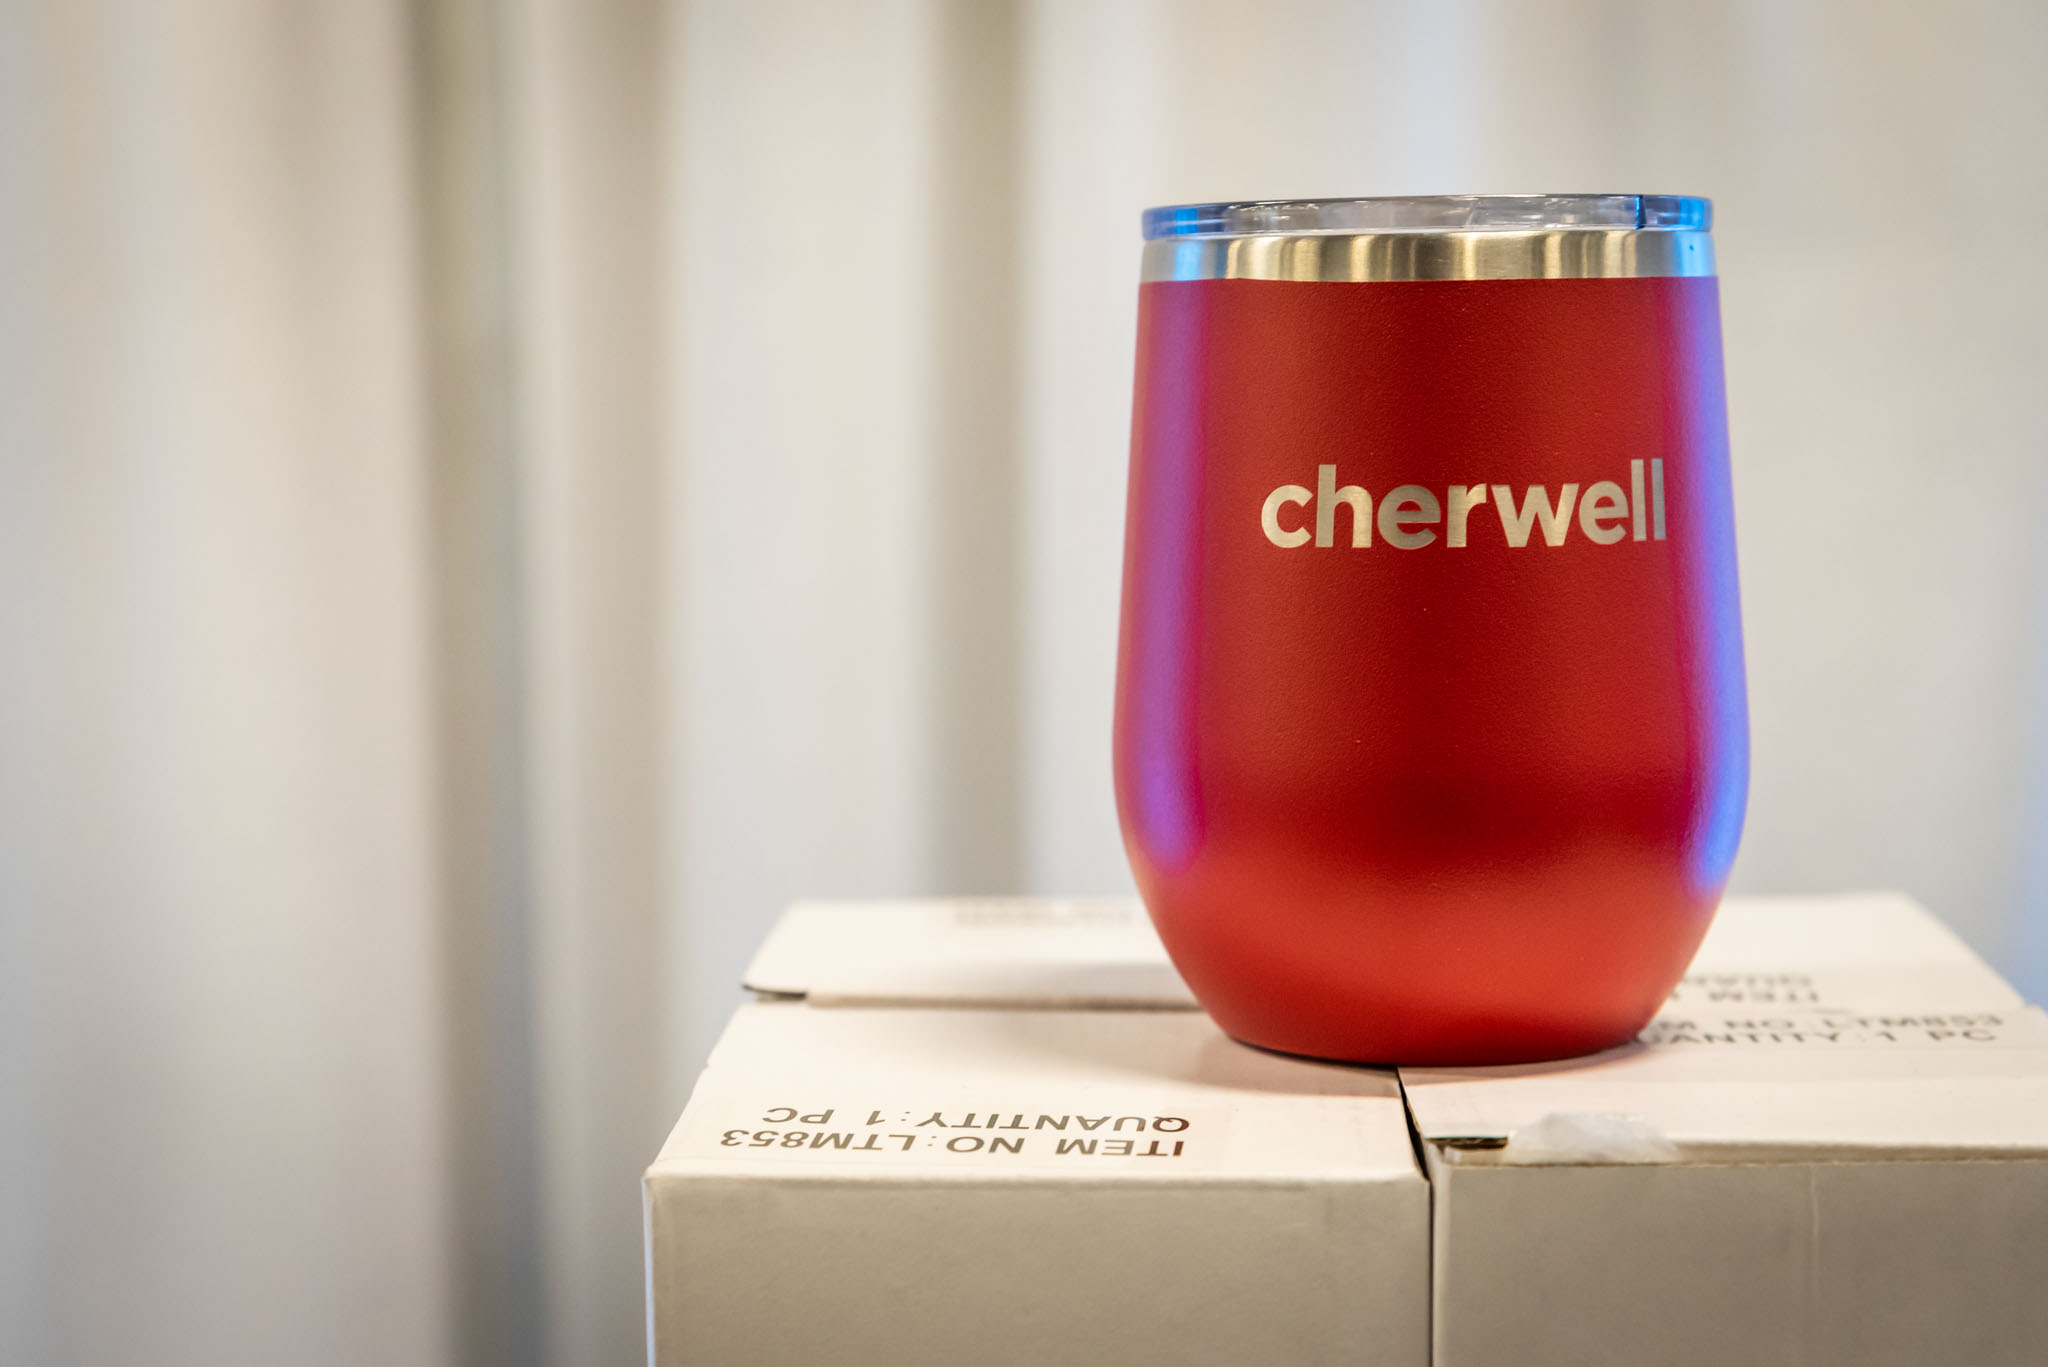 Cherwell_Clear_2019_287.jpg